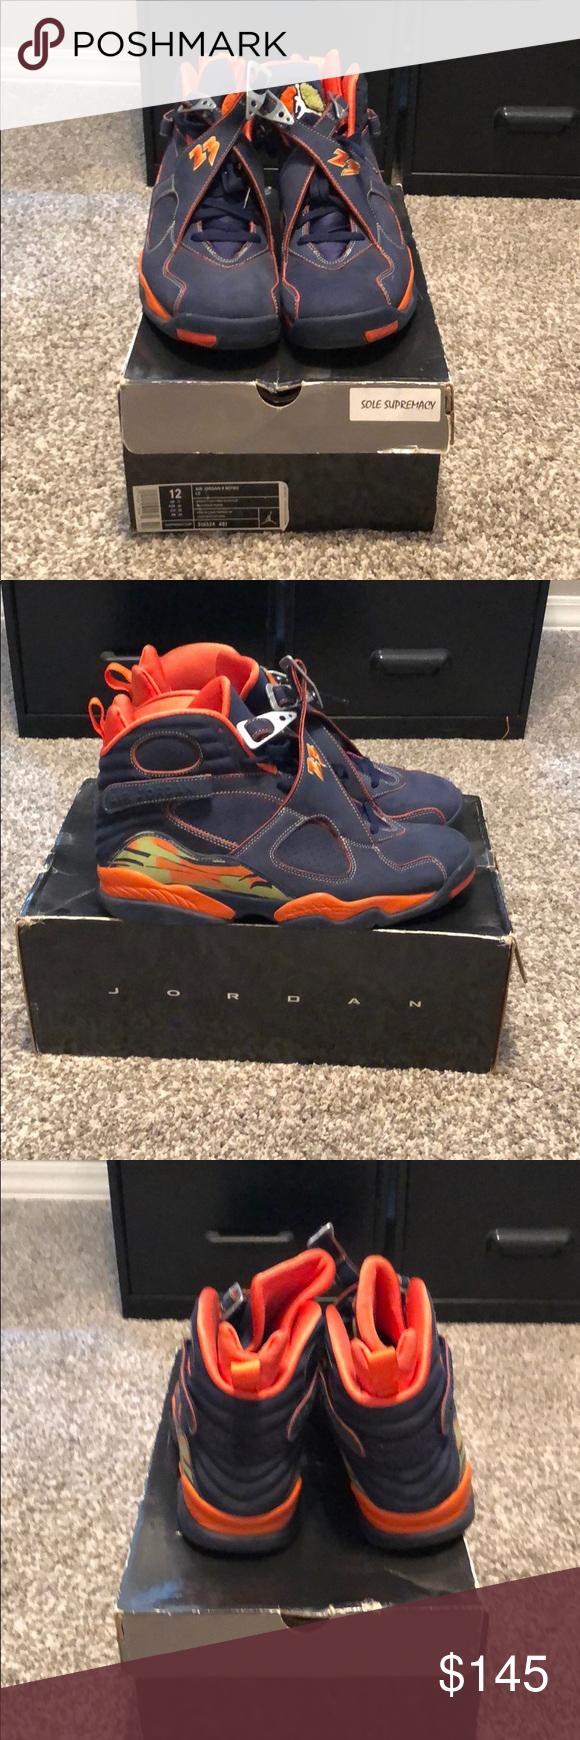 "Size 12 Air Jordan ""Pea Pod"" 8's   Air"